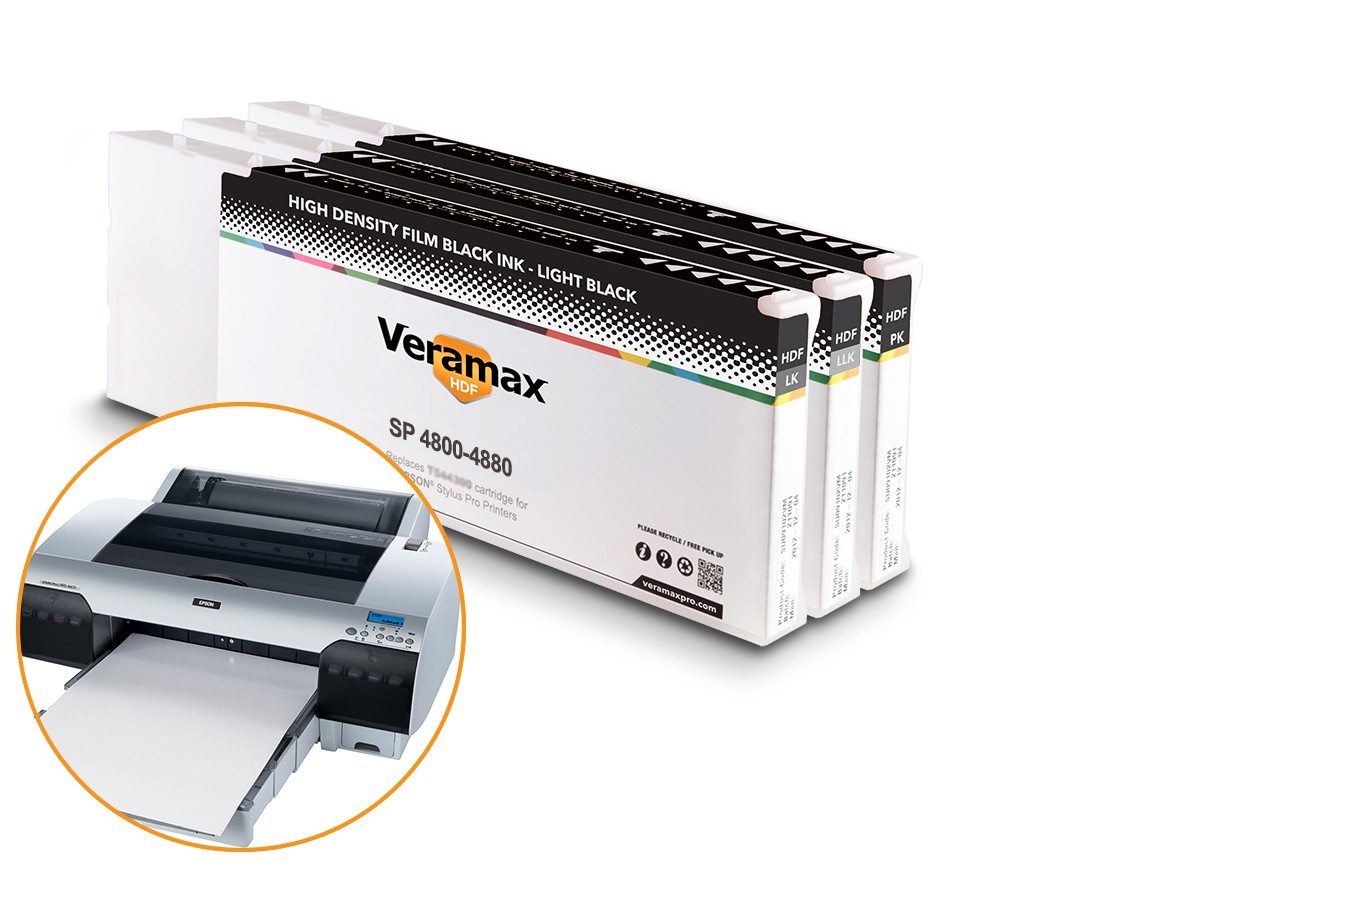 Veramax HDF Ink Cartridges for Stylus Pro 4880 Printers